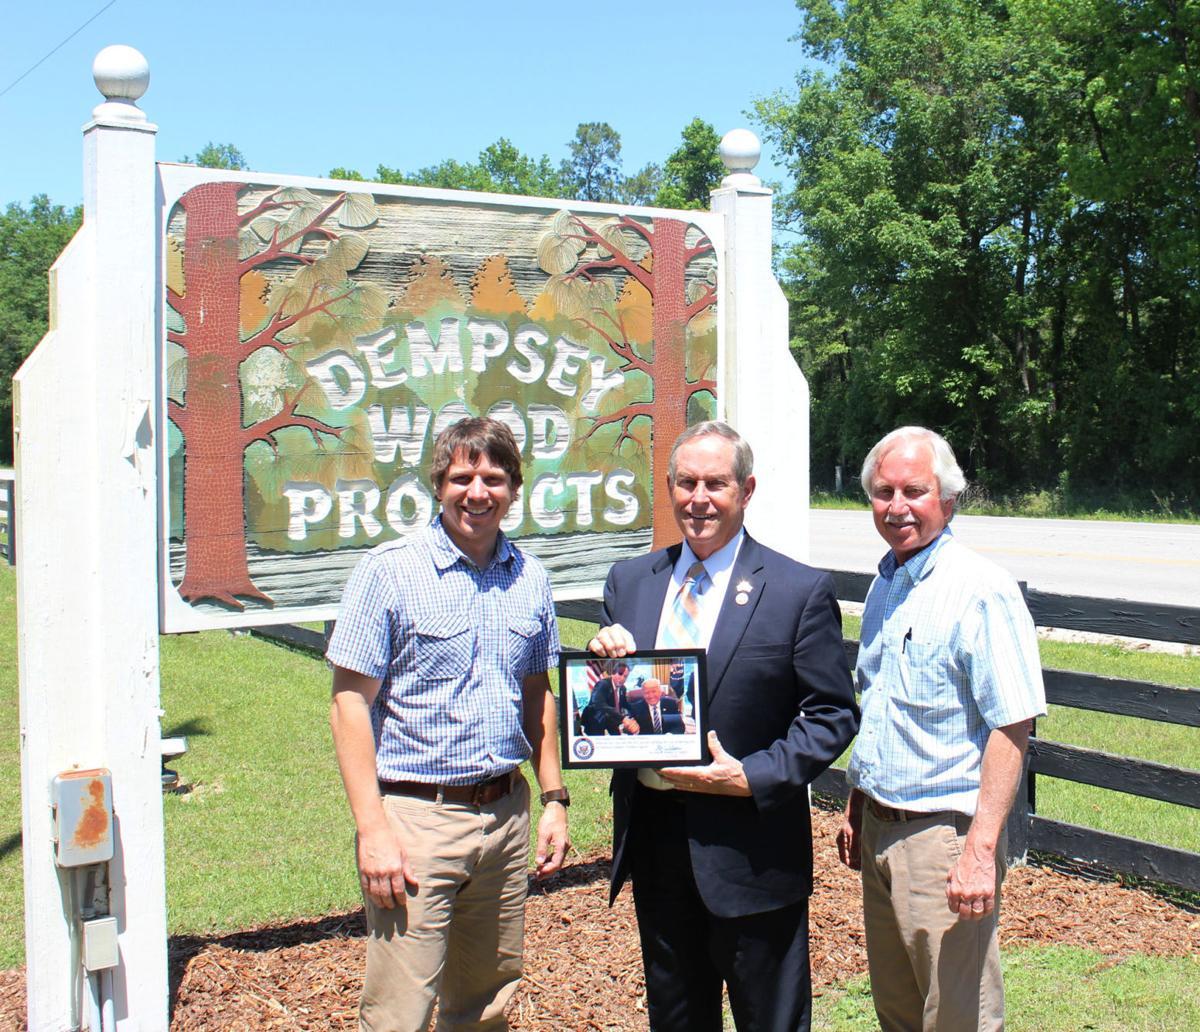 Wilson visits Dempsey